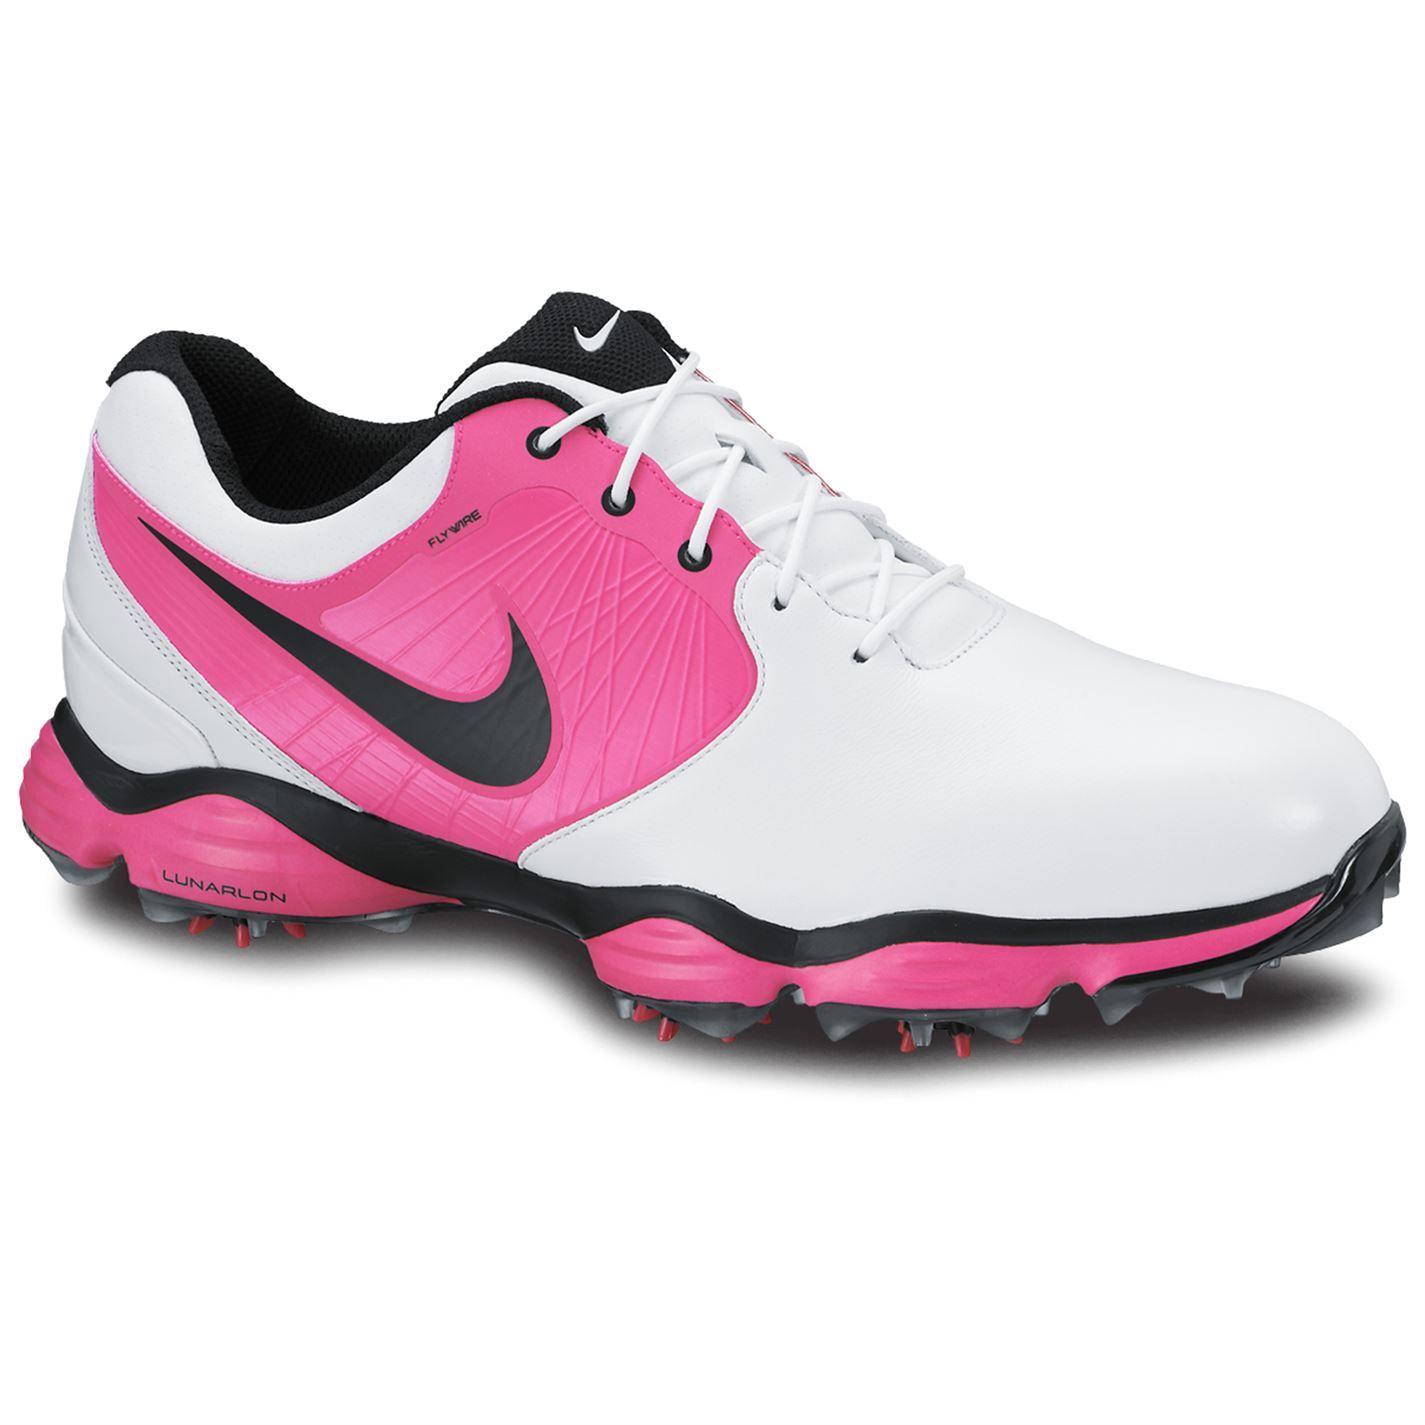 Nike Lunar Control Mens Golf Shoes >> Now £94.99 Golf